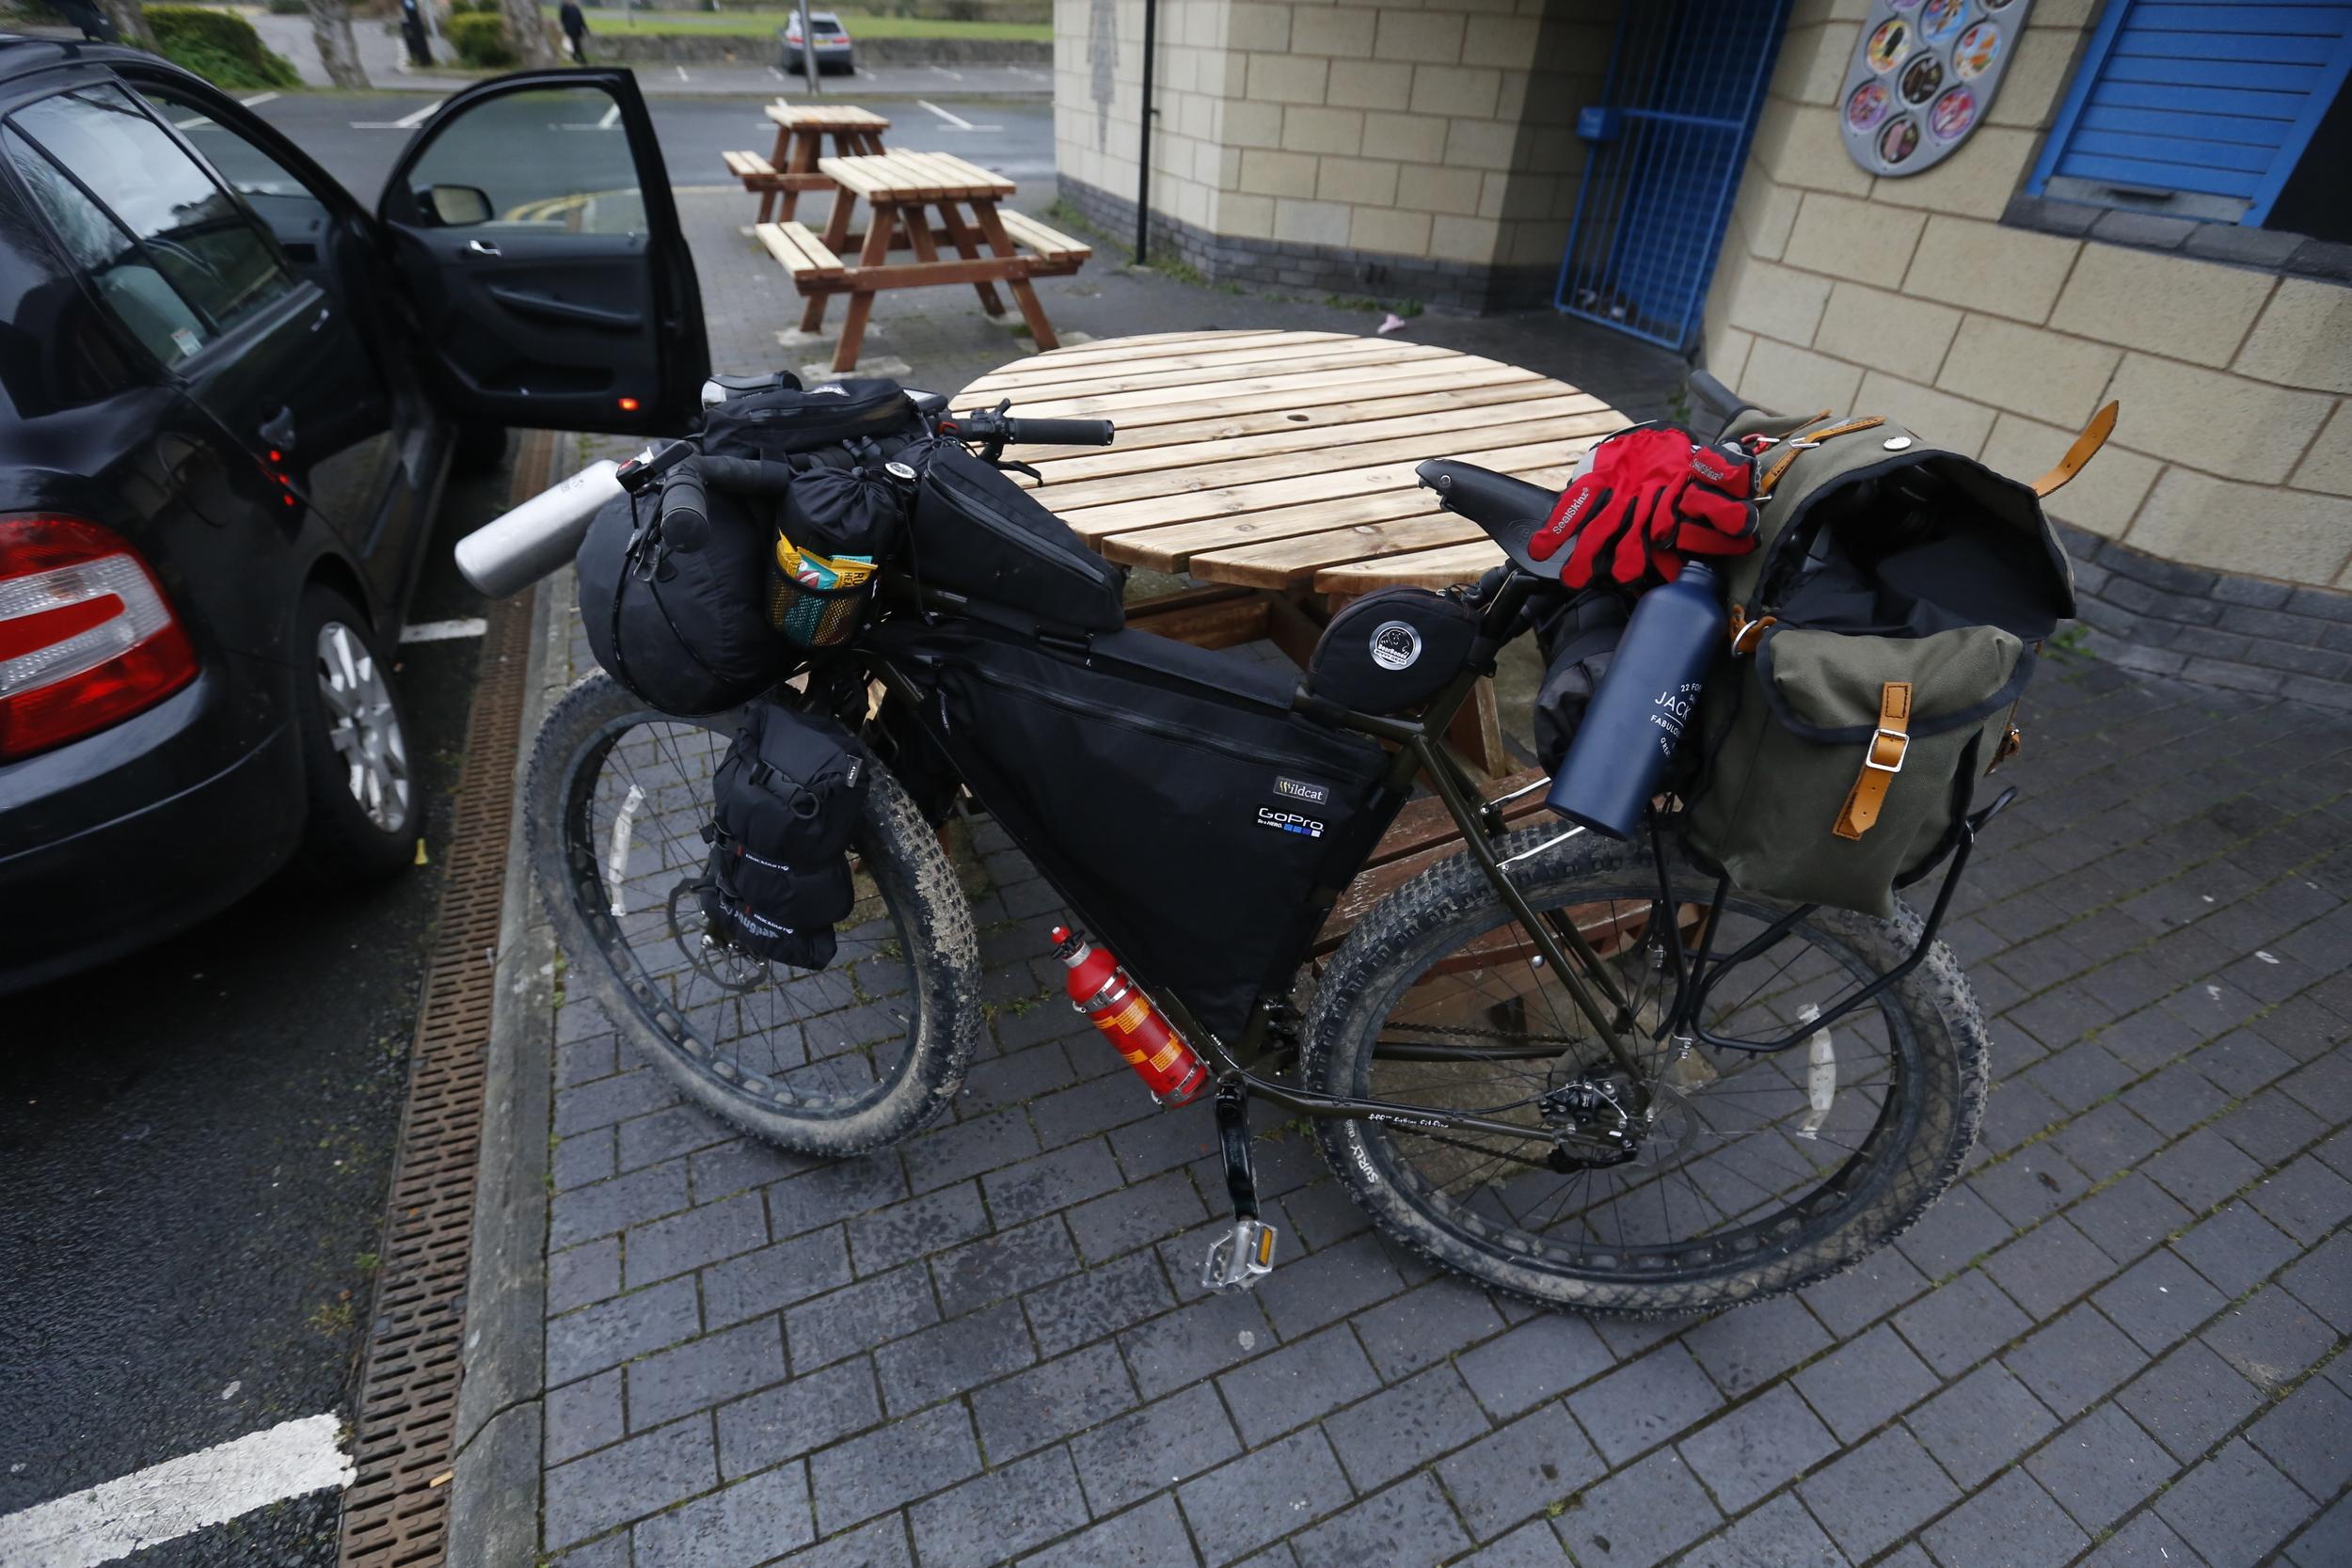 "surly, surly ecr, surly bikes, bicycle touring apocalypse, bikepacking, bikepacking bike, 29er, knards, 3"" tyres, fat bike, fat bike touring, cycling, cycling blog, bikepacking blog, travel, explore, travel blog, photography blog"